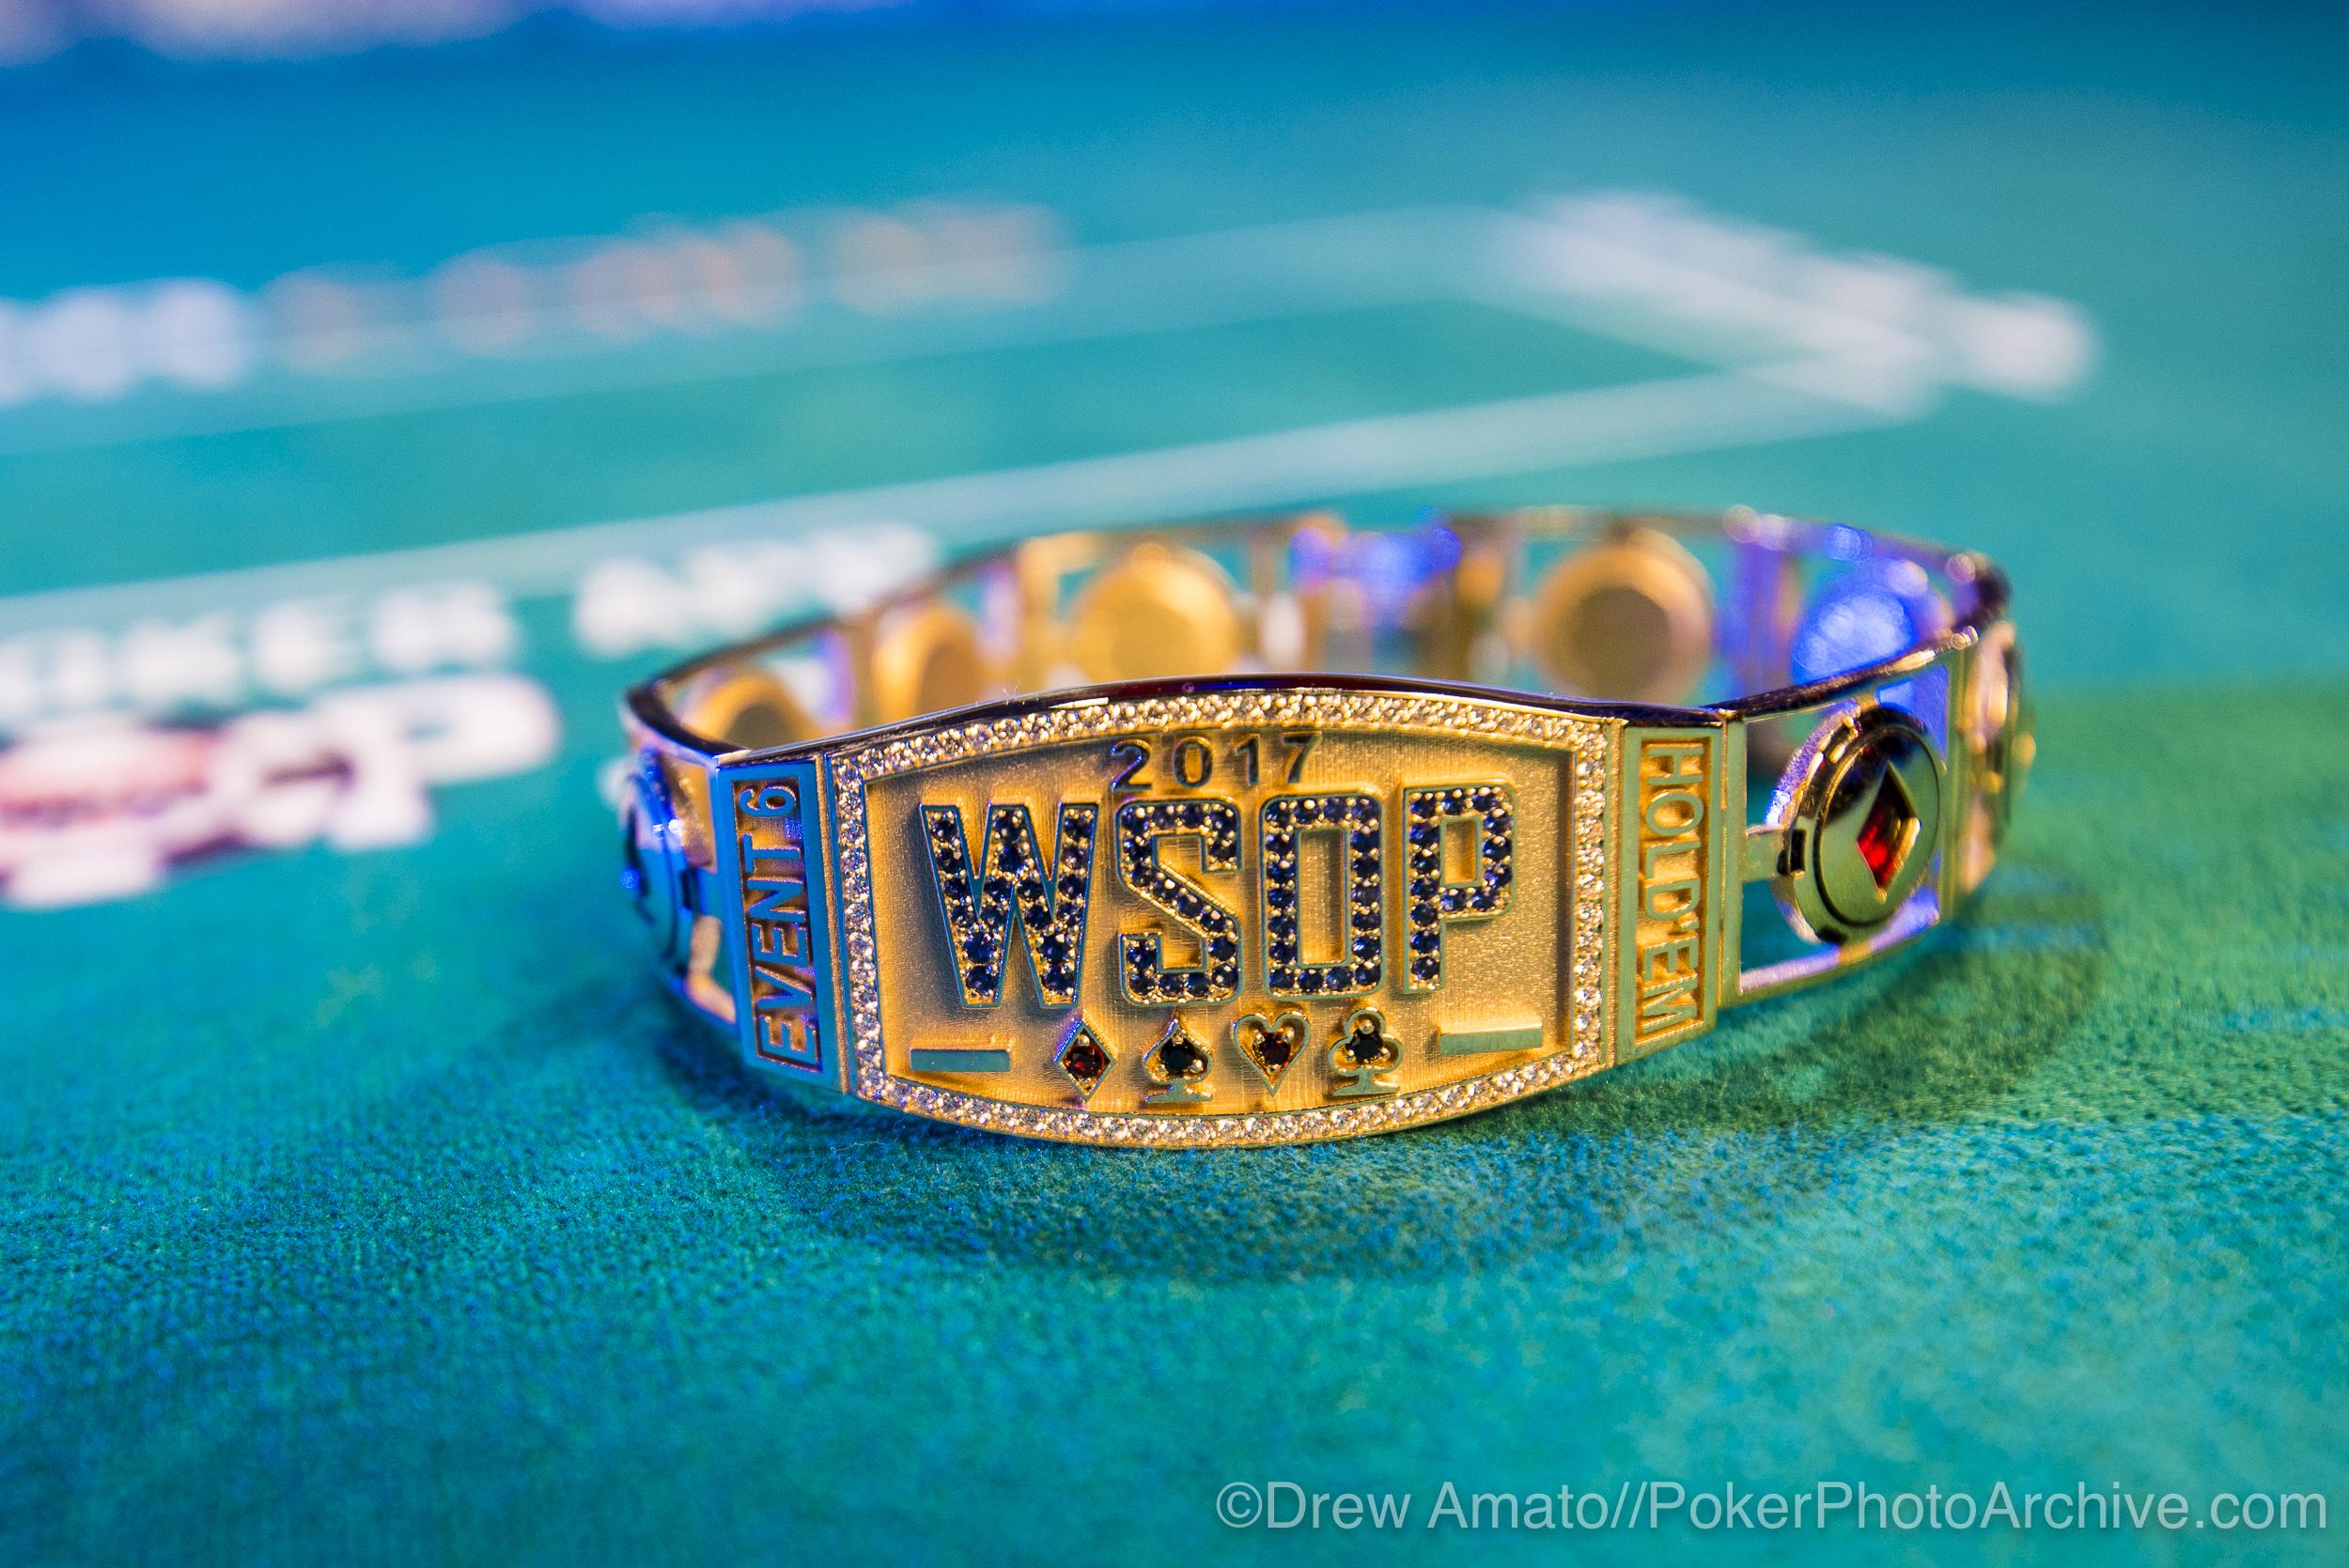 WSOP Bracelet_2017 WSOP_EV010_Day 3_Amato_DA60998.jpg